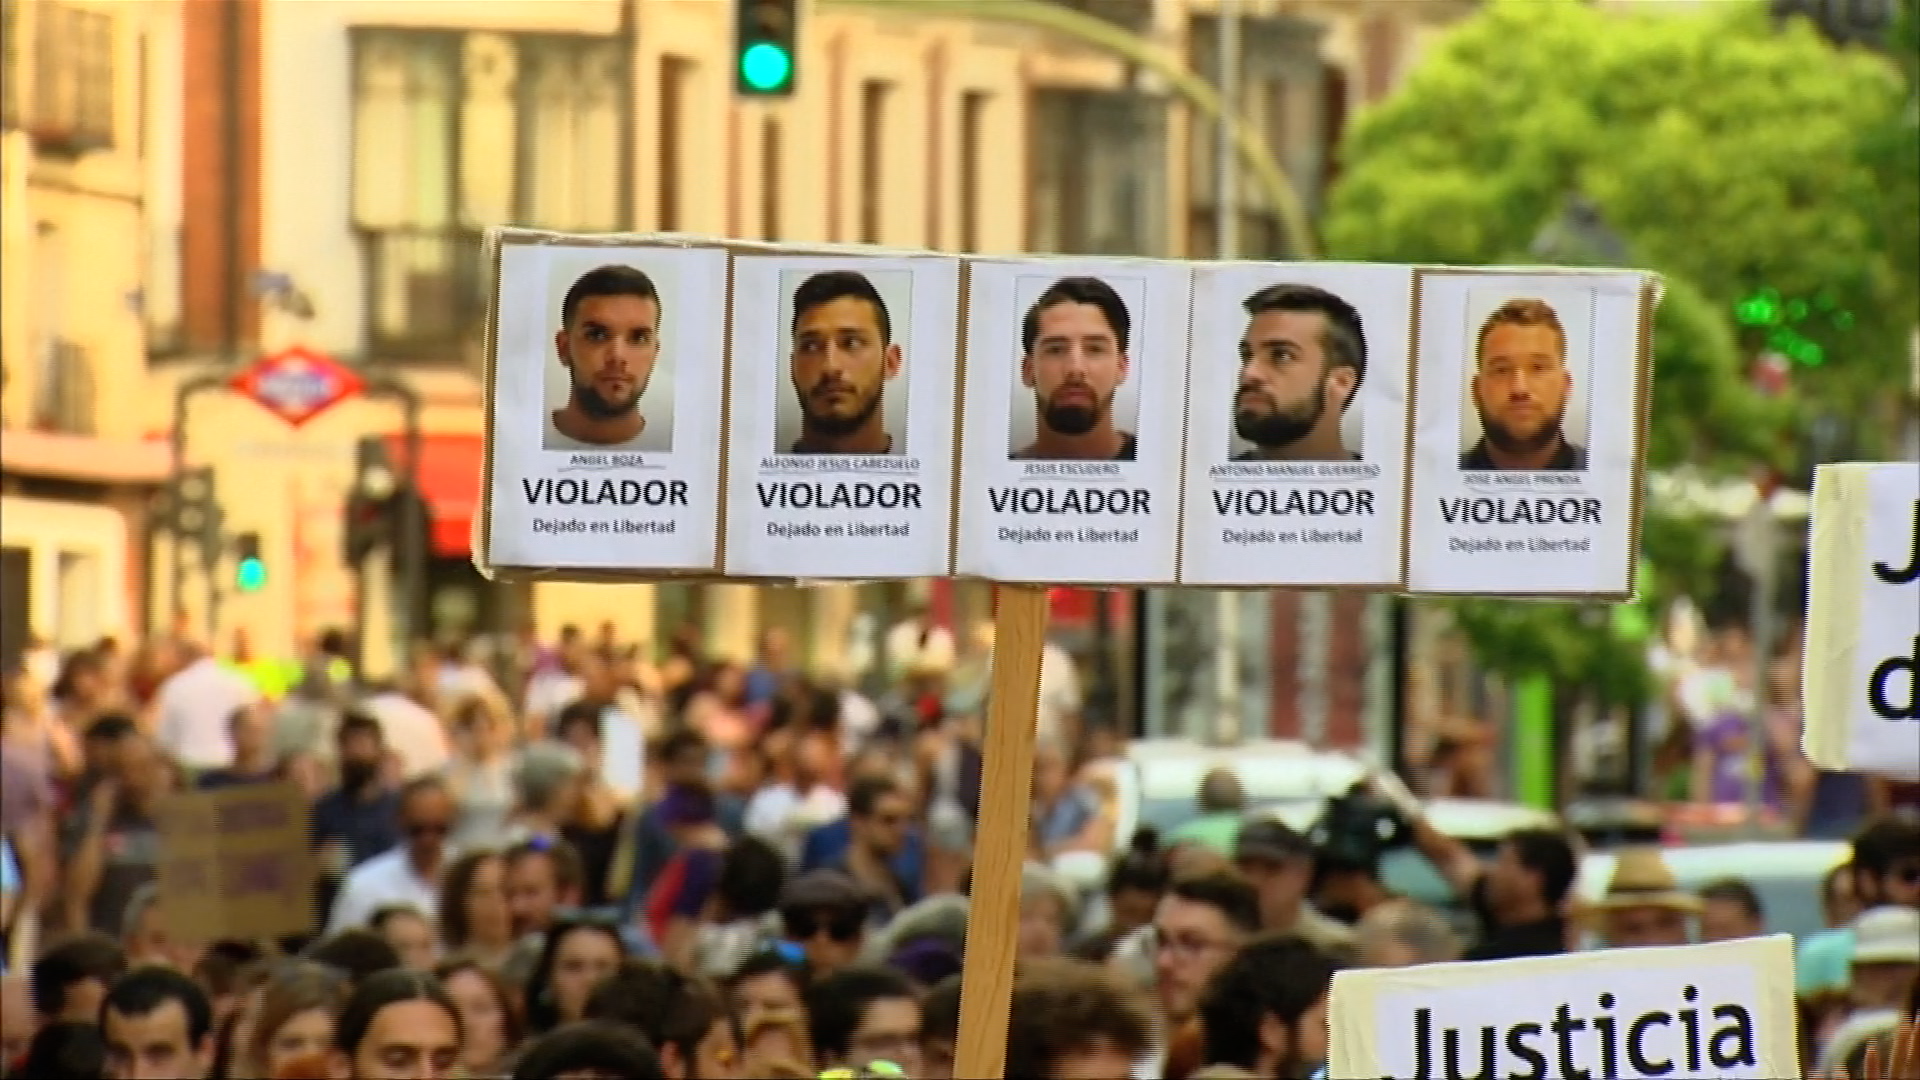 Marocké sex videa